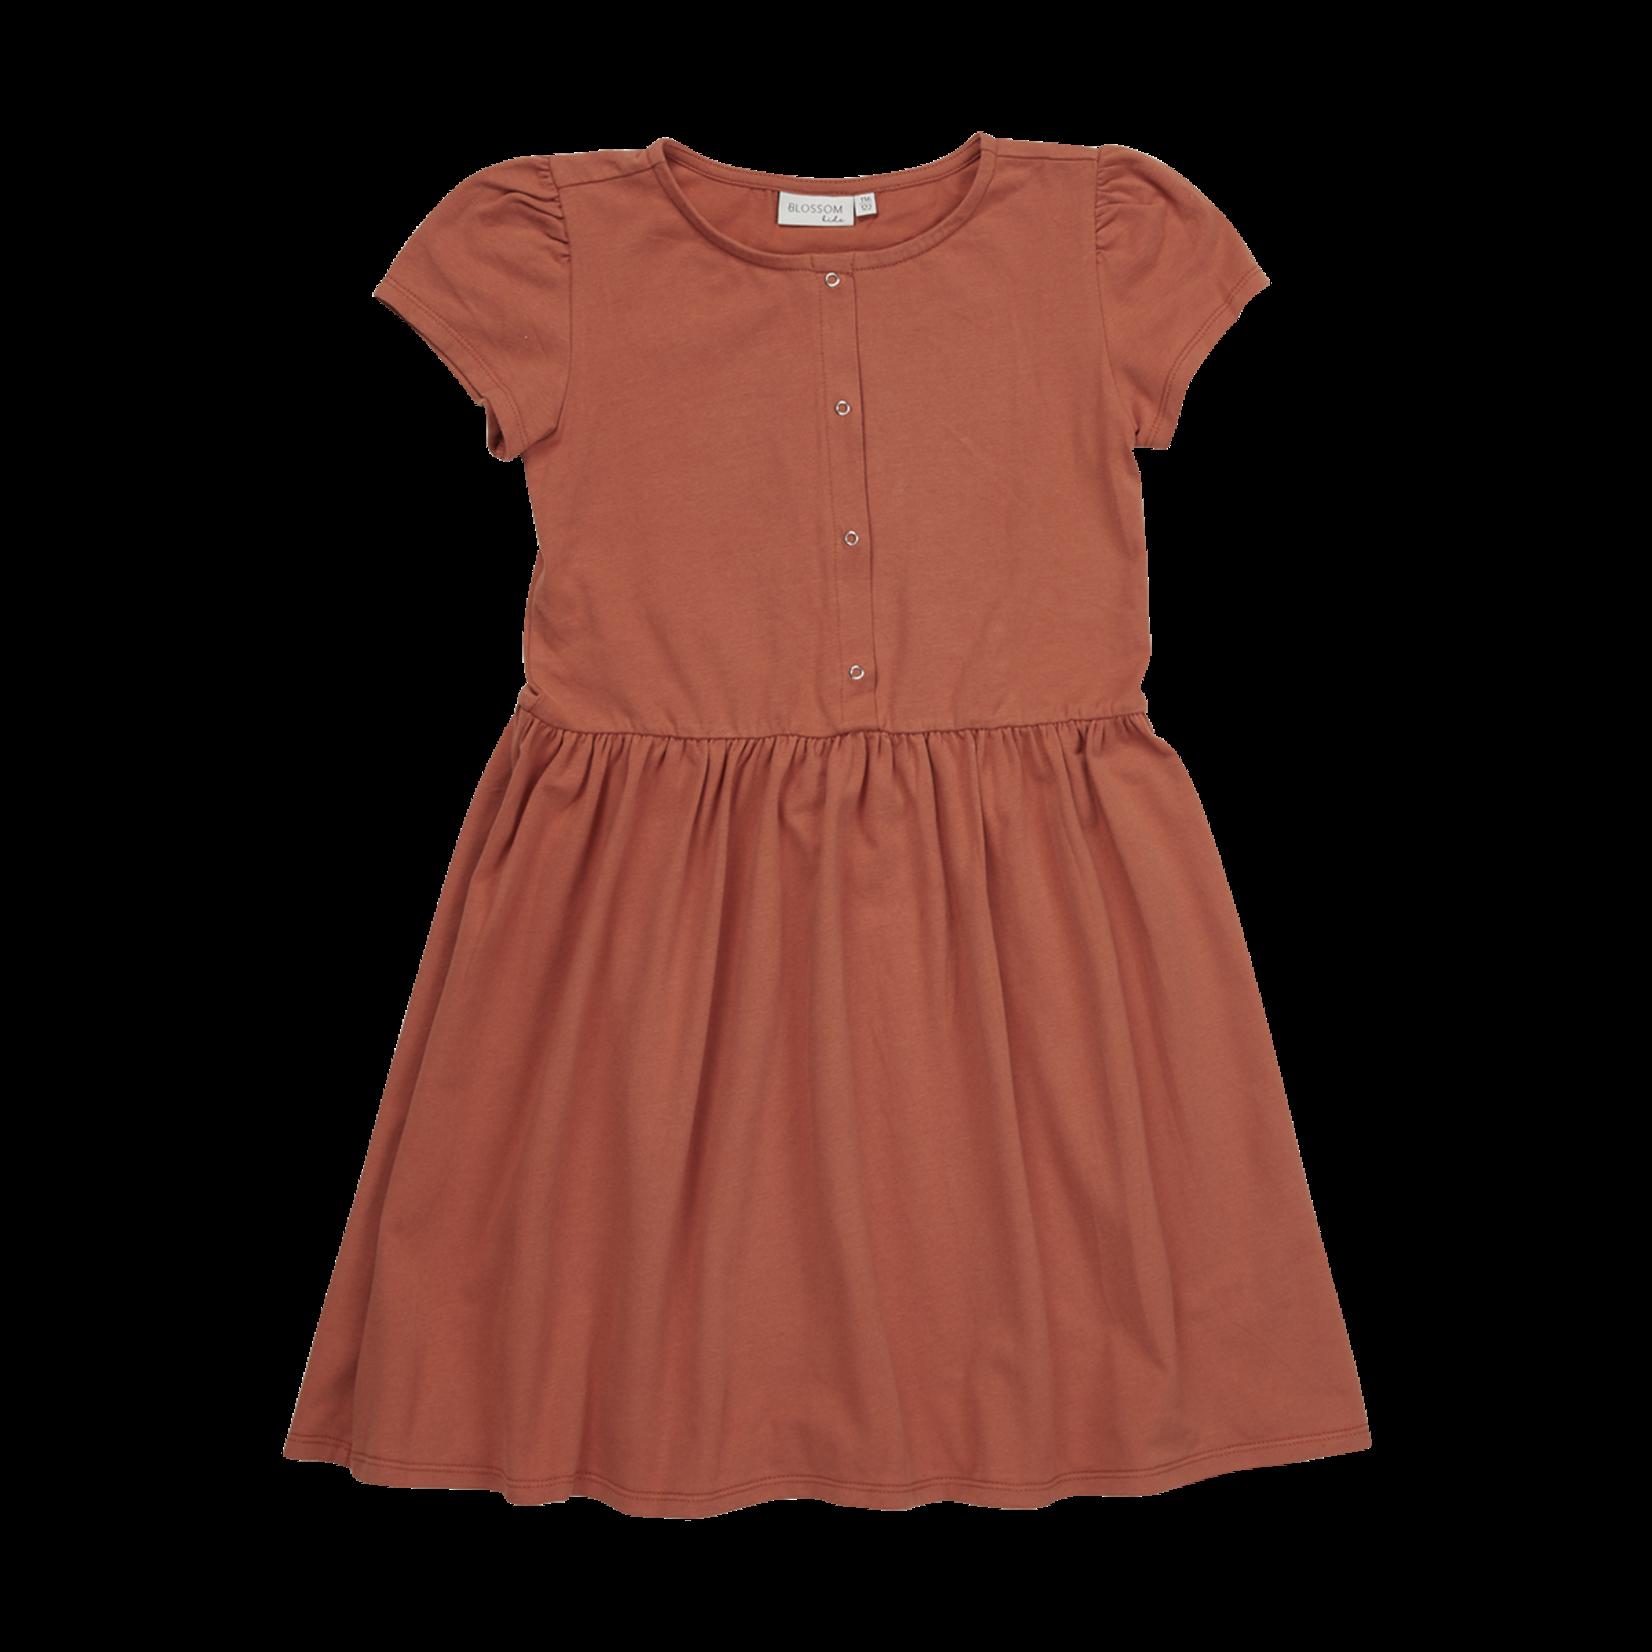 Blossom Kids BK - Dress - Dusty Coral